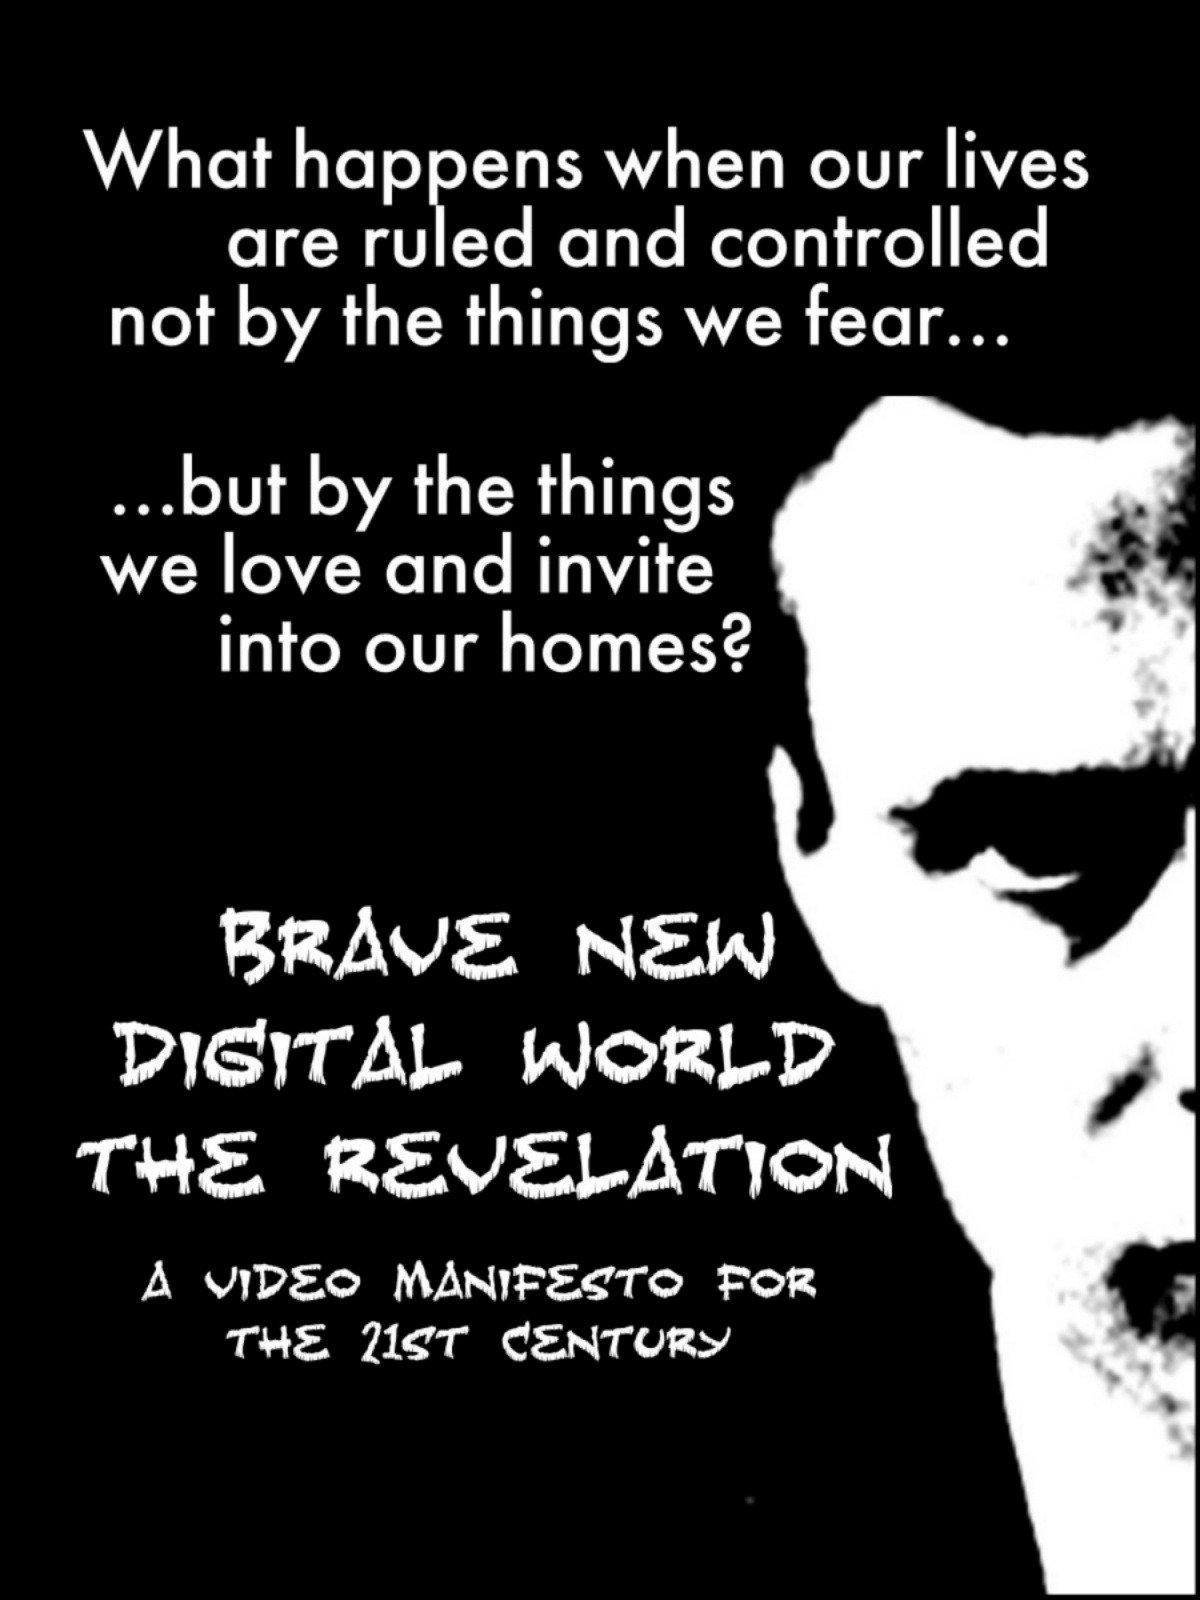 Brave New Digital World: The Revelation